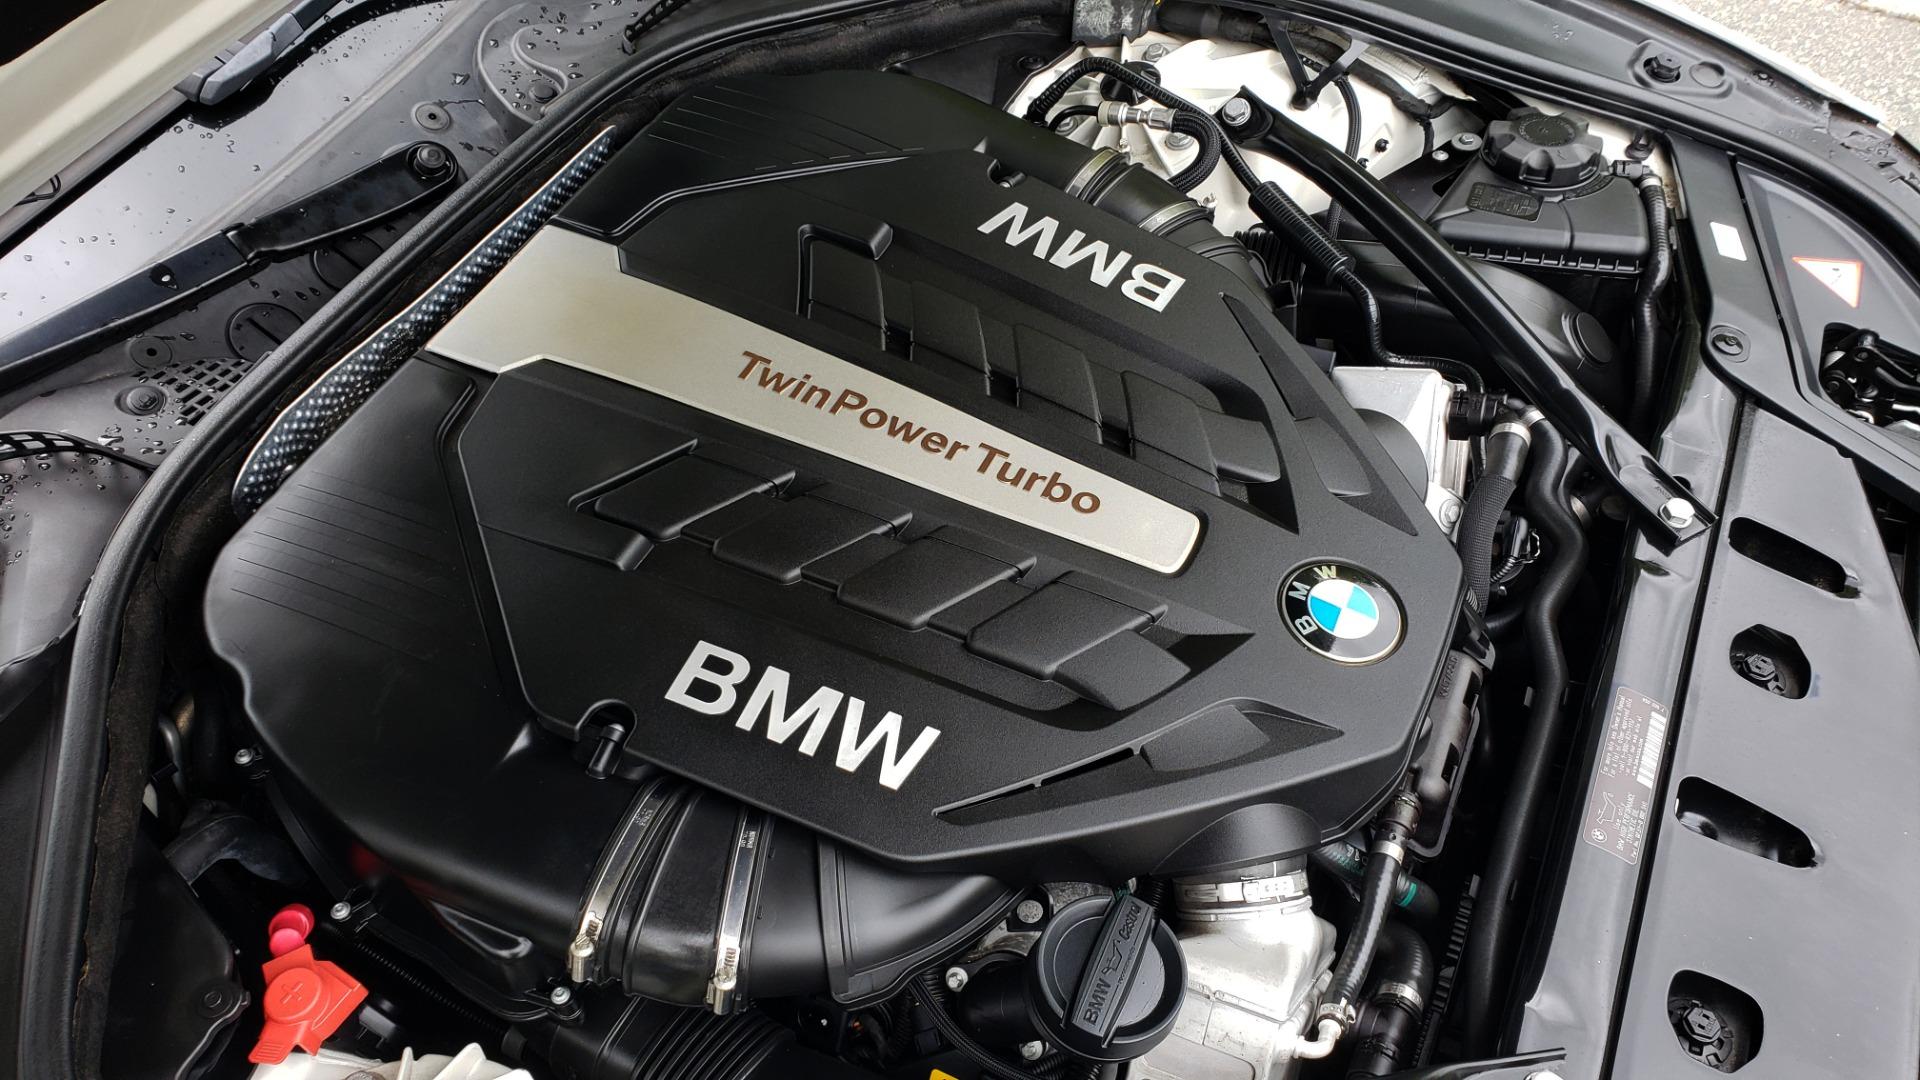 Used 2012 BMW 5 SERIES 550I M SPORT / NAV / CONV PKG / SUNROOF / PREM SND / REARVIEW for sale Sold at Formula Imports in Charlotte NC 28227 14